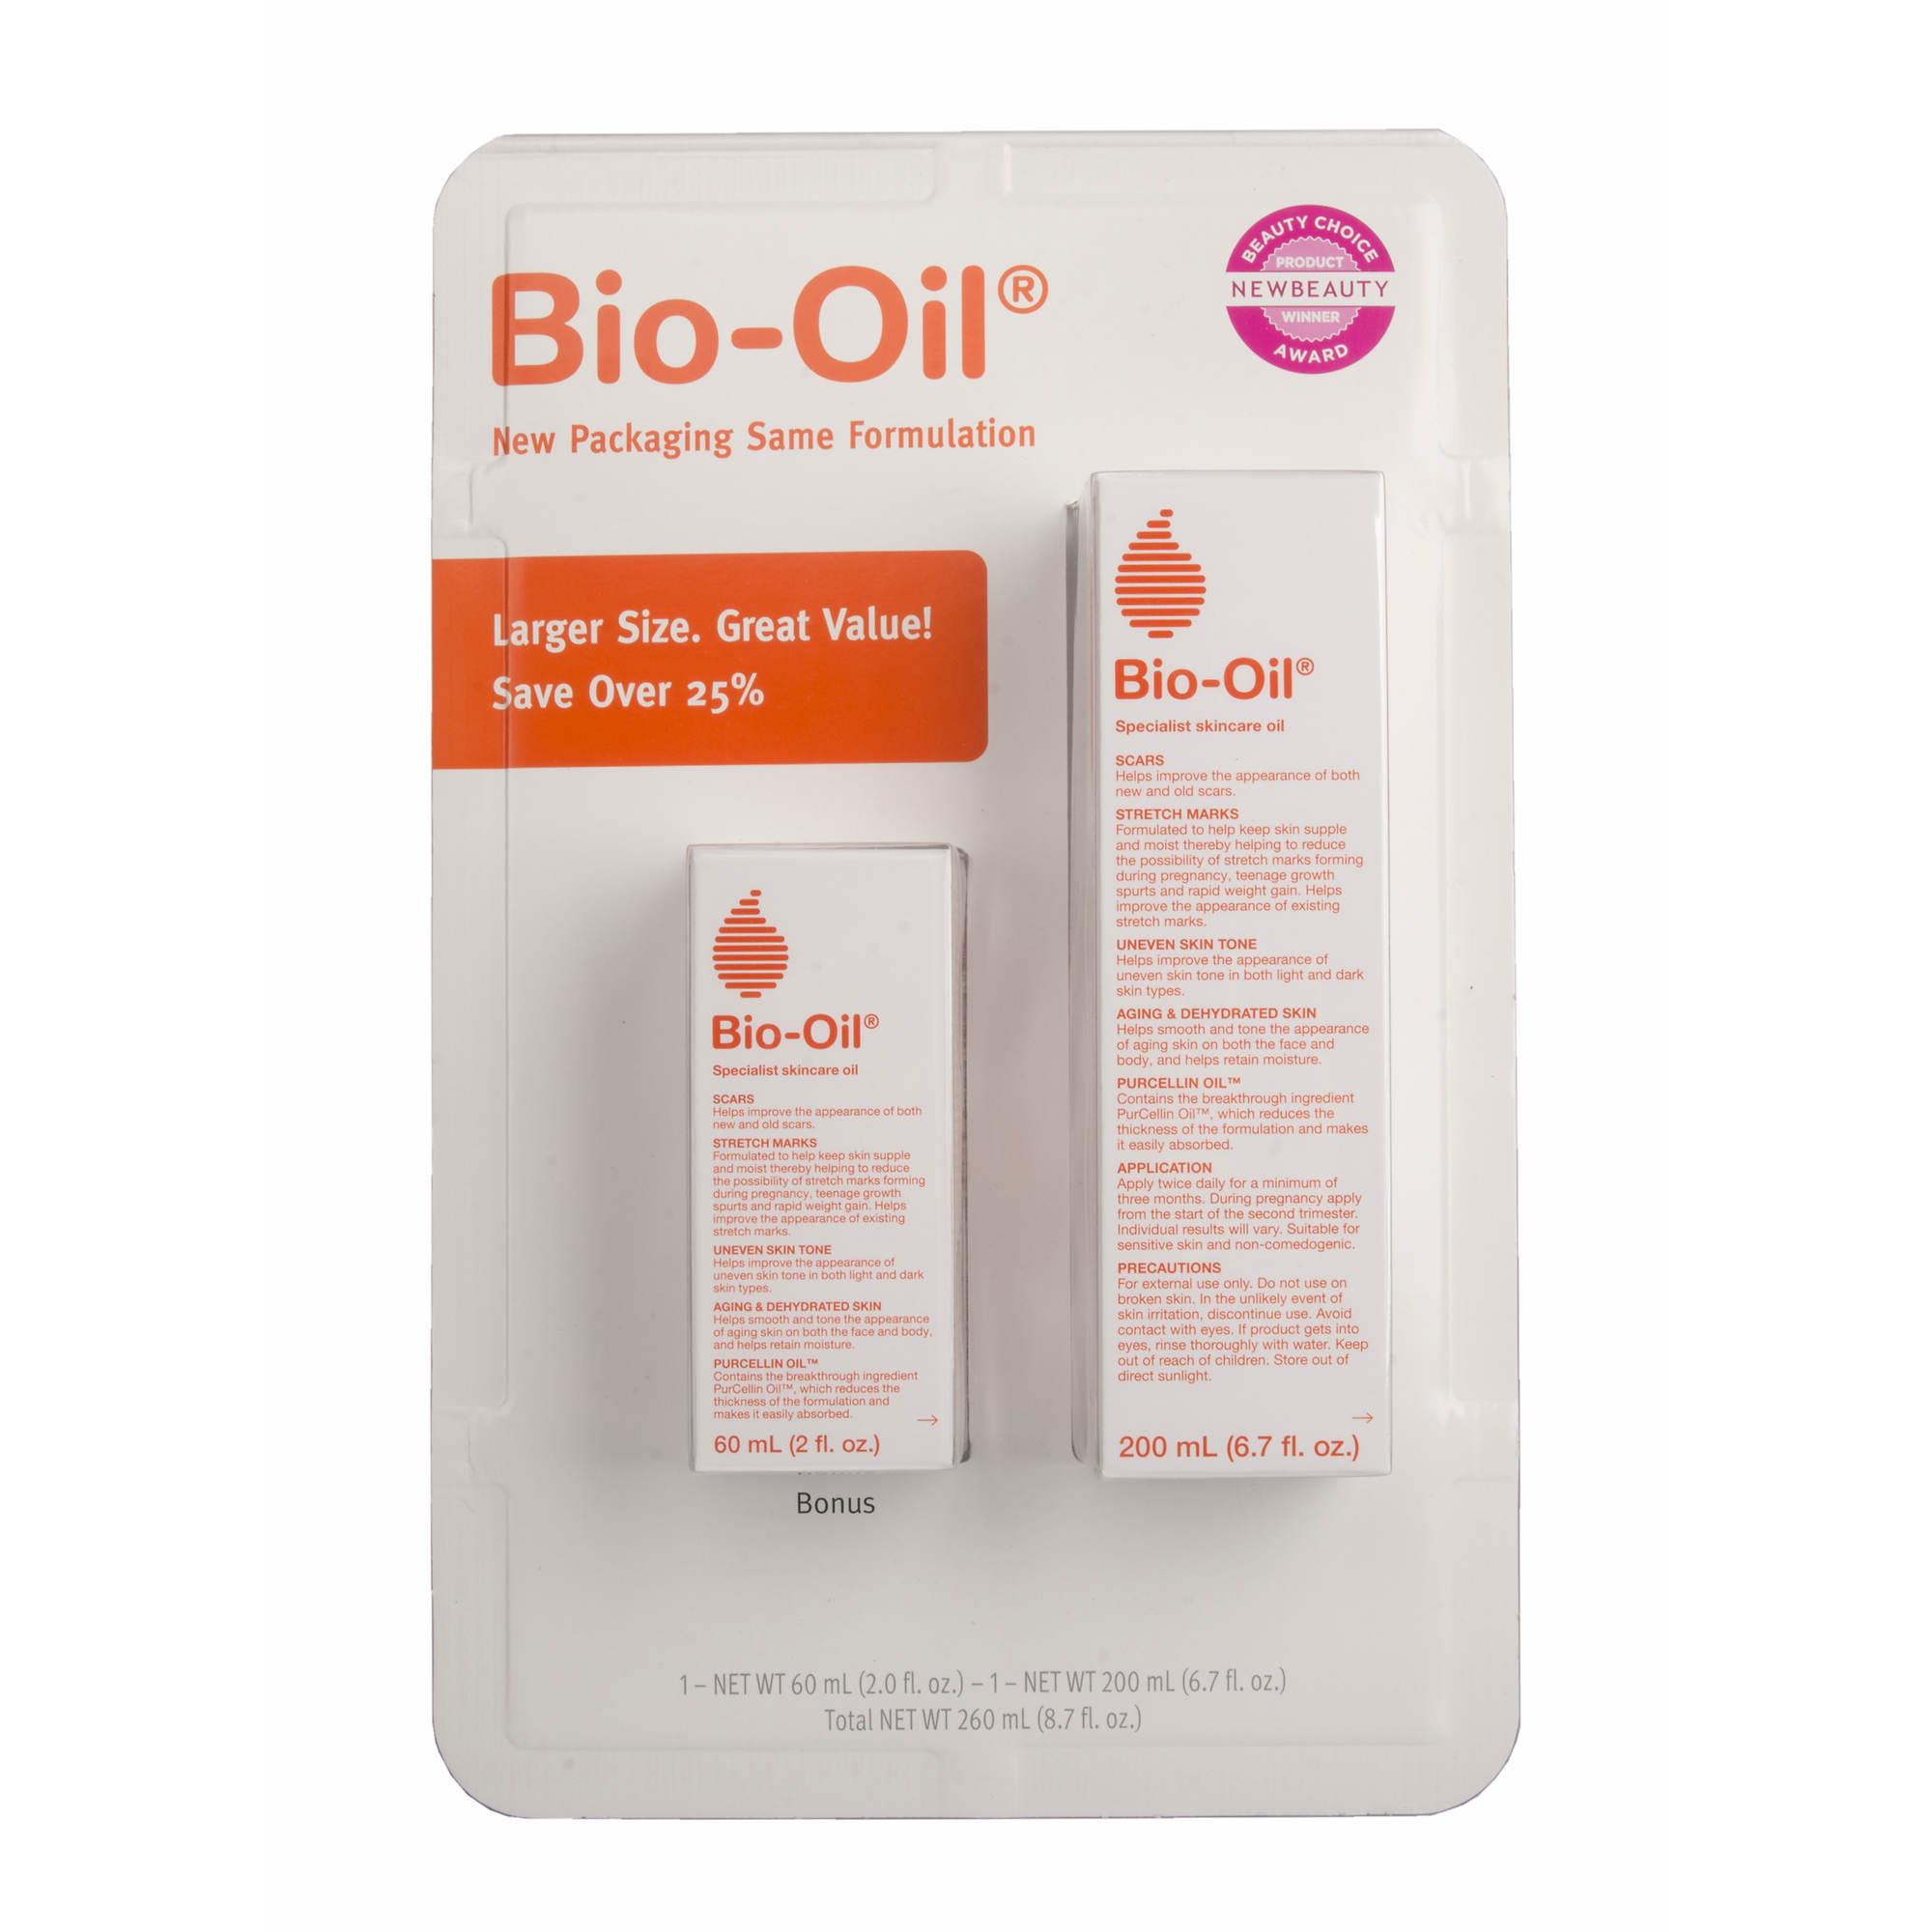 Bio-Oil Specialist Skincare Set, 6.7 oz. and 2 oz. - BJs WholeSale Club